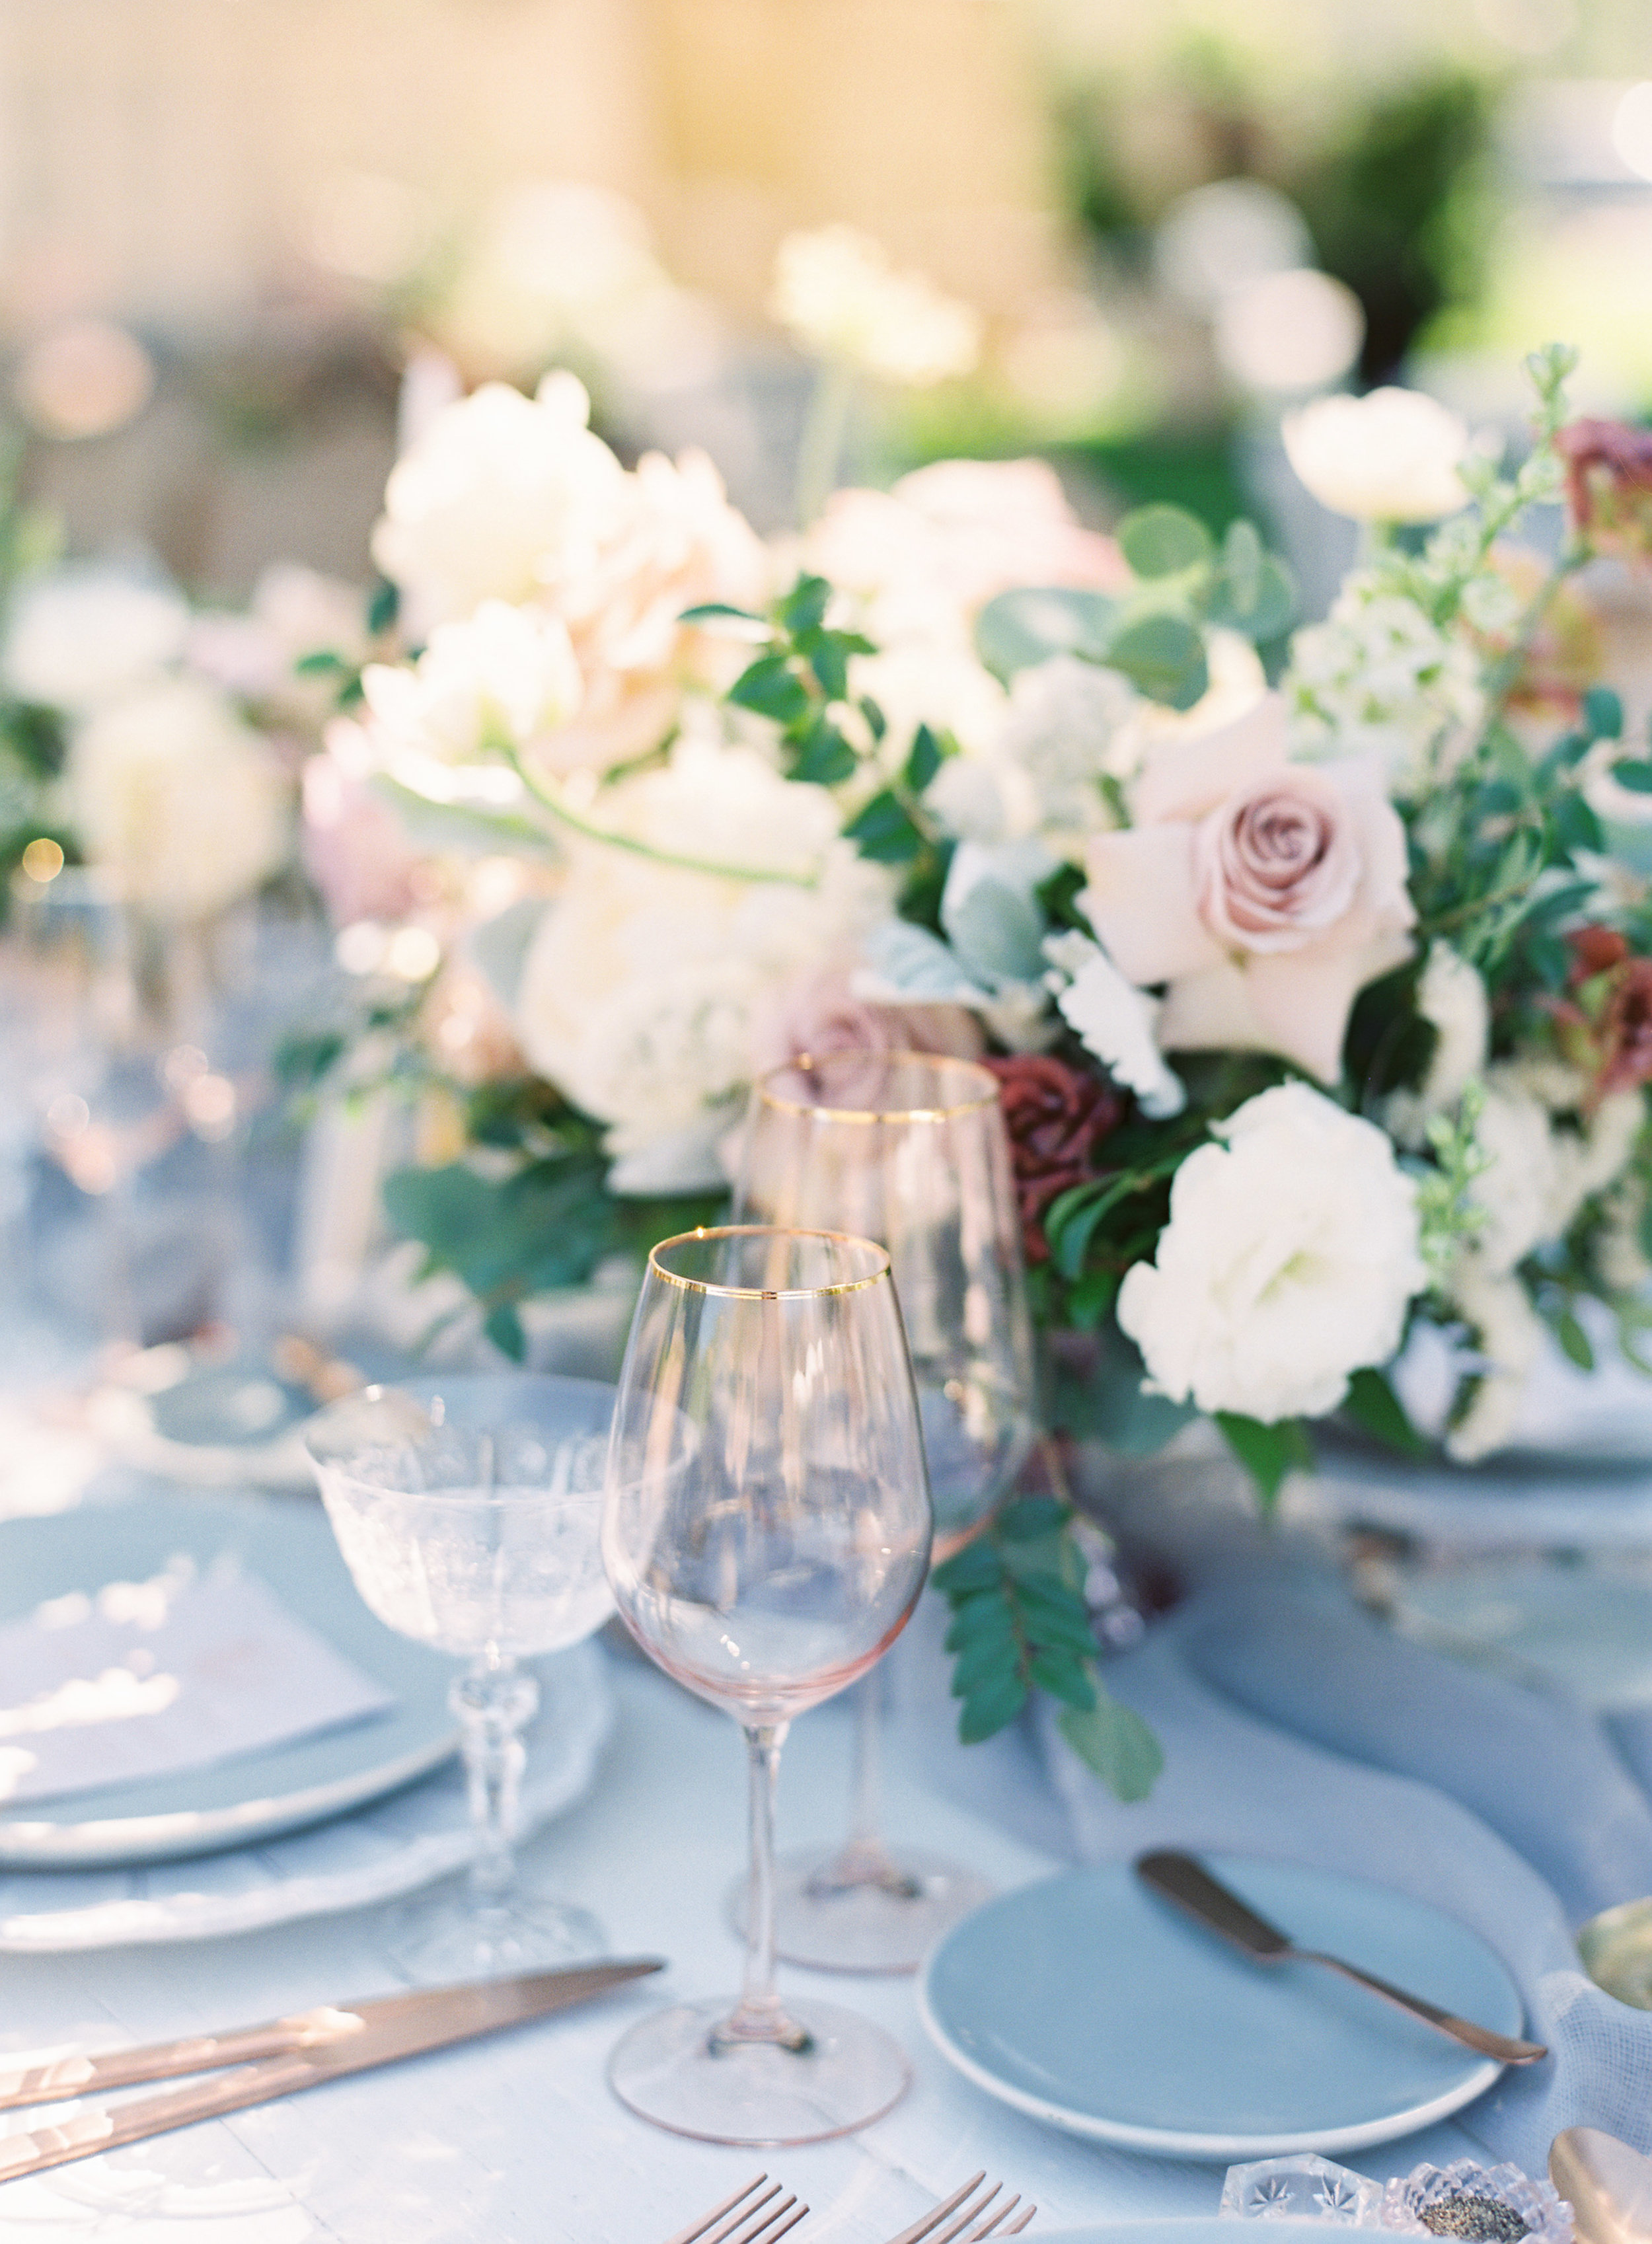 Triunfo_Creek_Winery_Wedding-176-Jen-Huang-JL-307-Jen-Huang-009963-R1-010.jpg